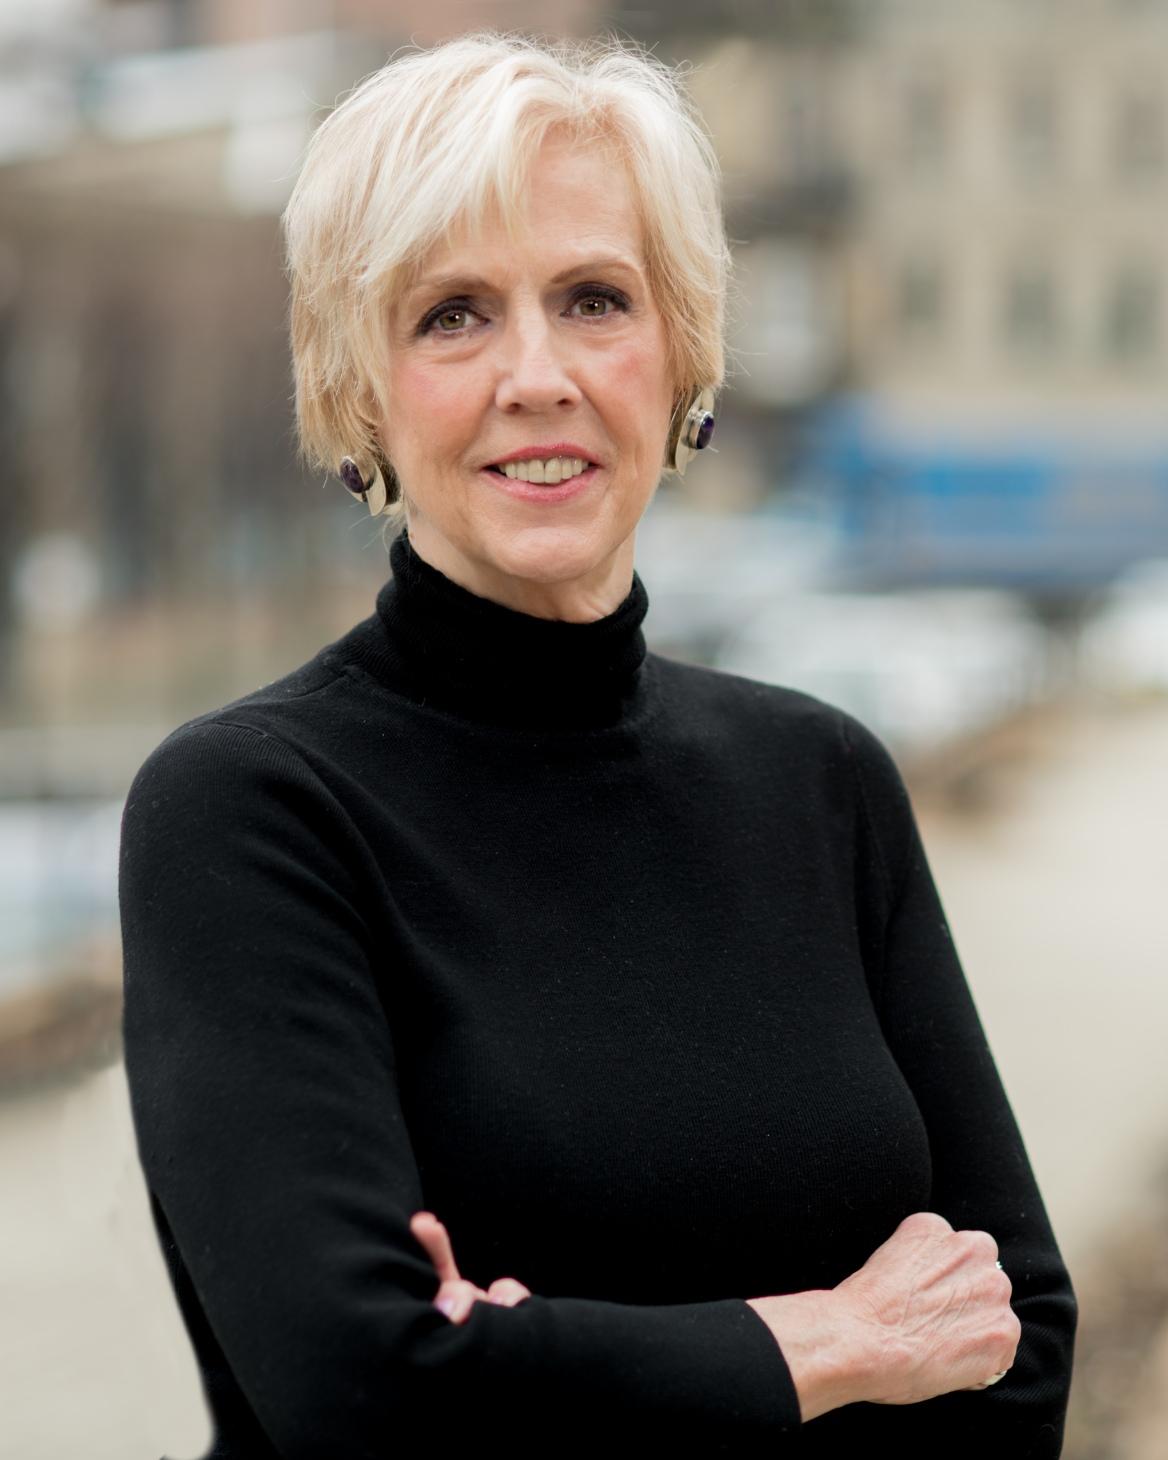 Kathleen Petrone